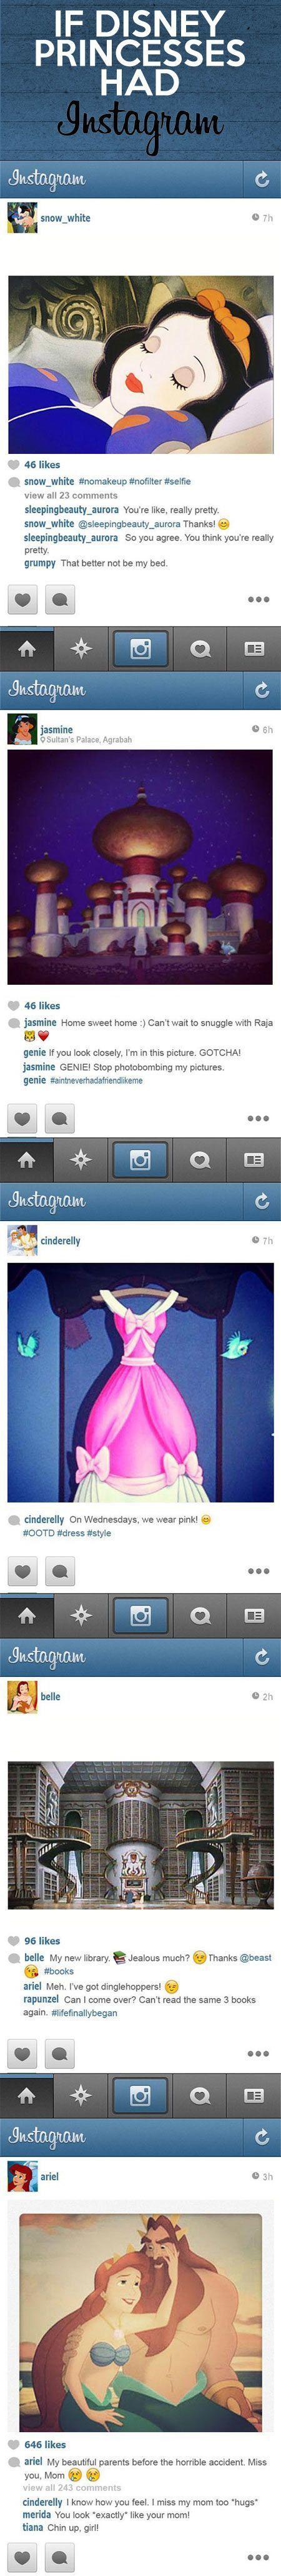 Disney Princesses on Instagram